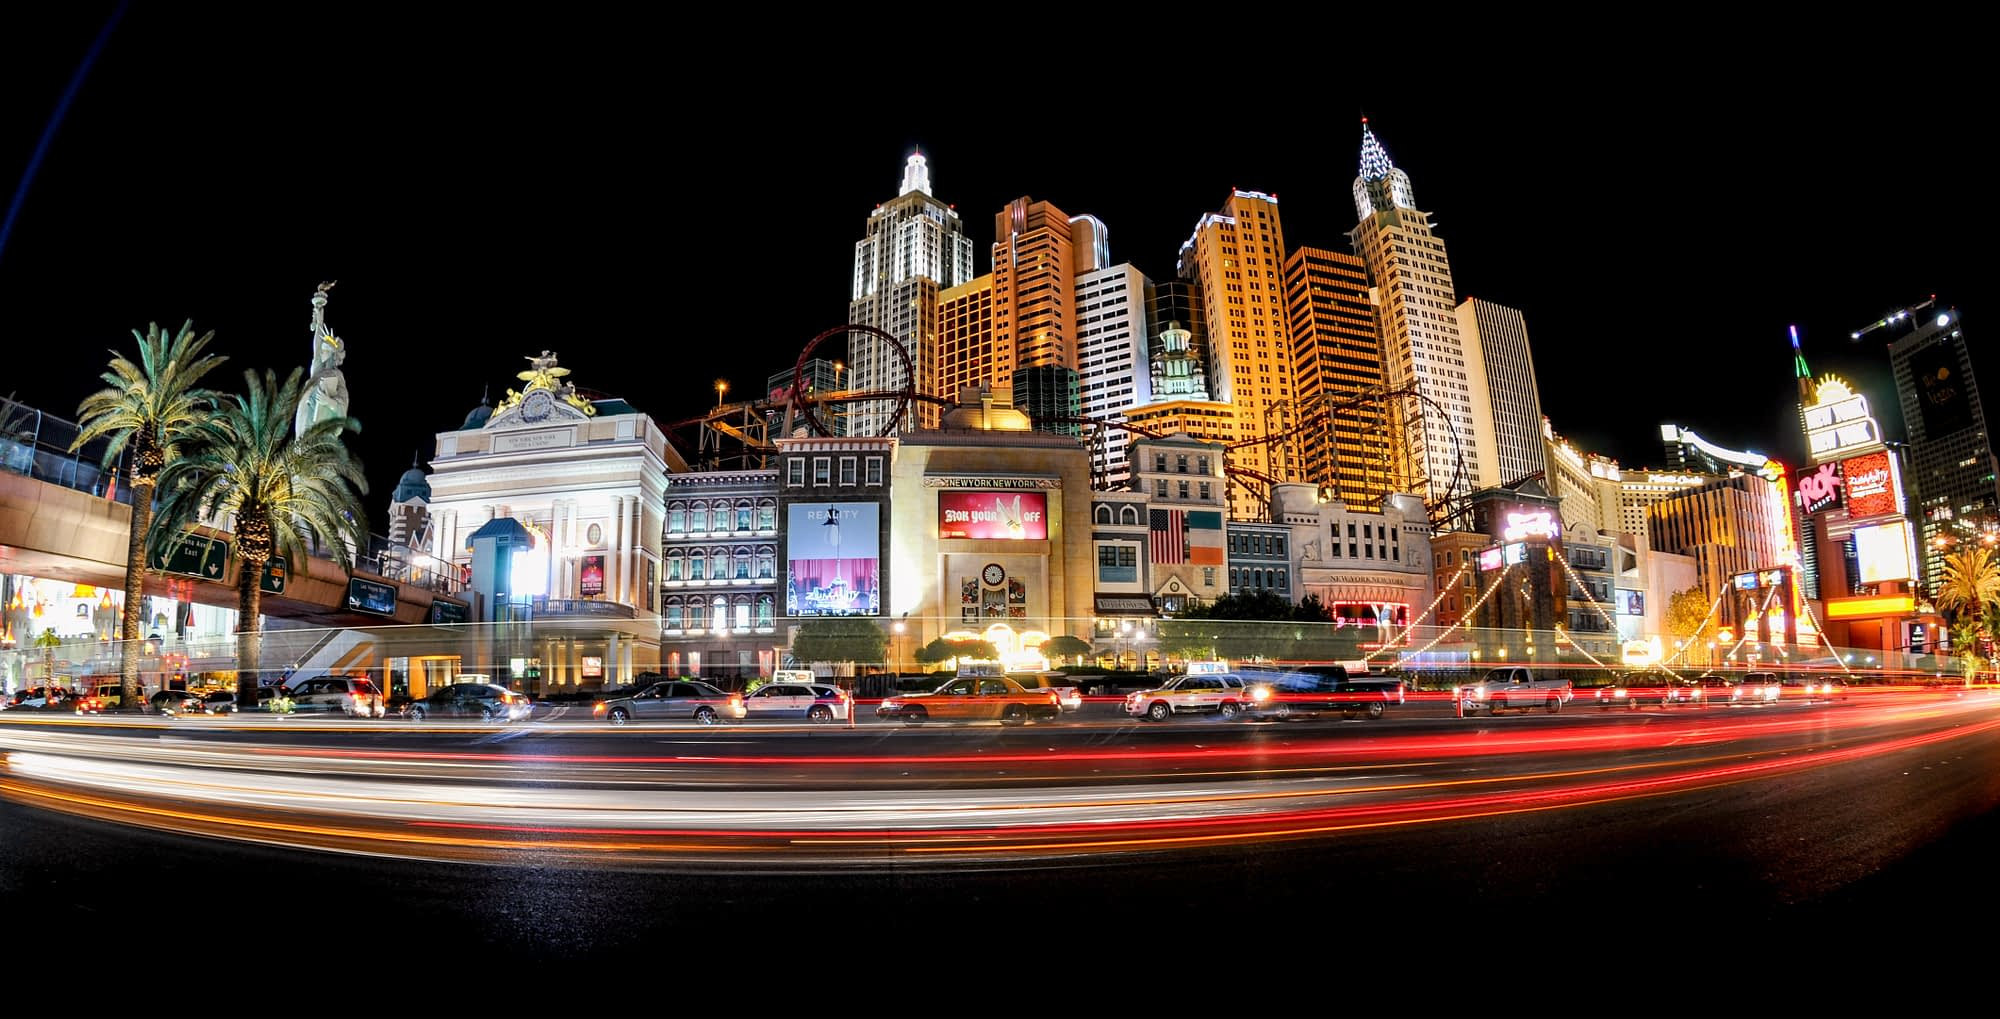 Work and Travel in Casinos - work in Las Vegas